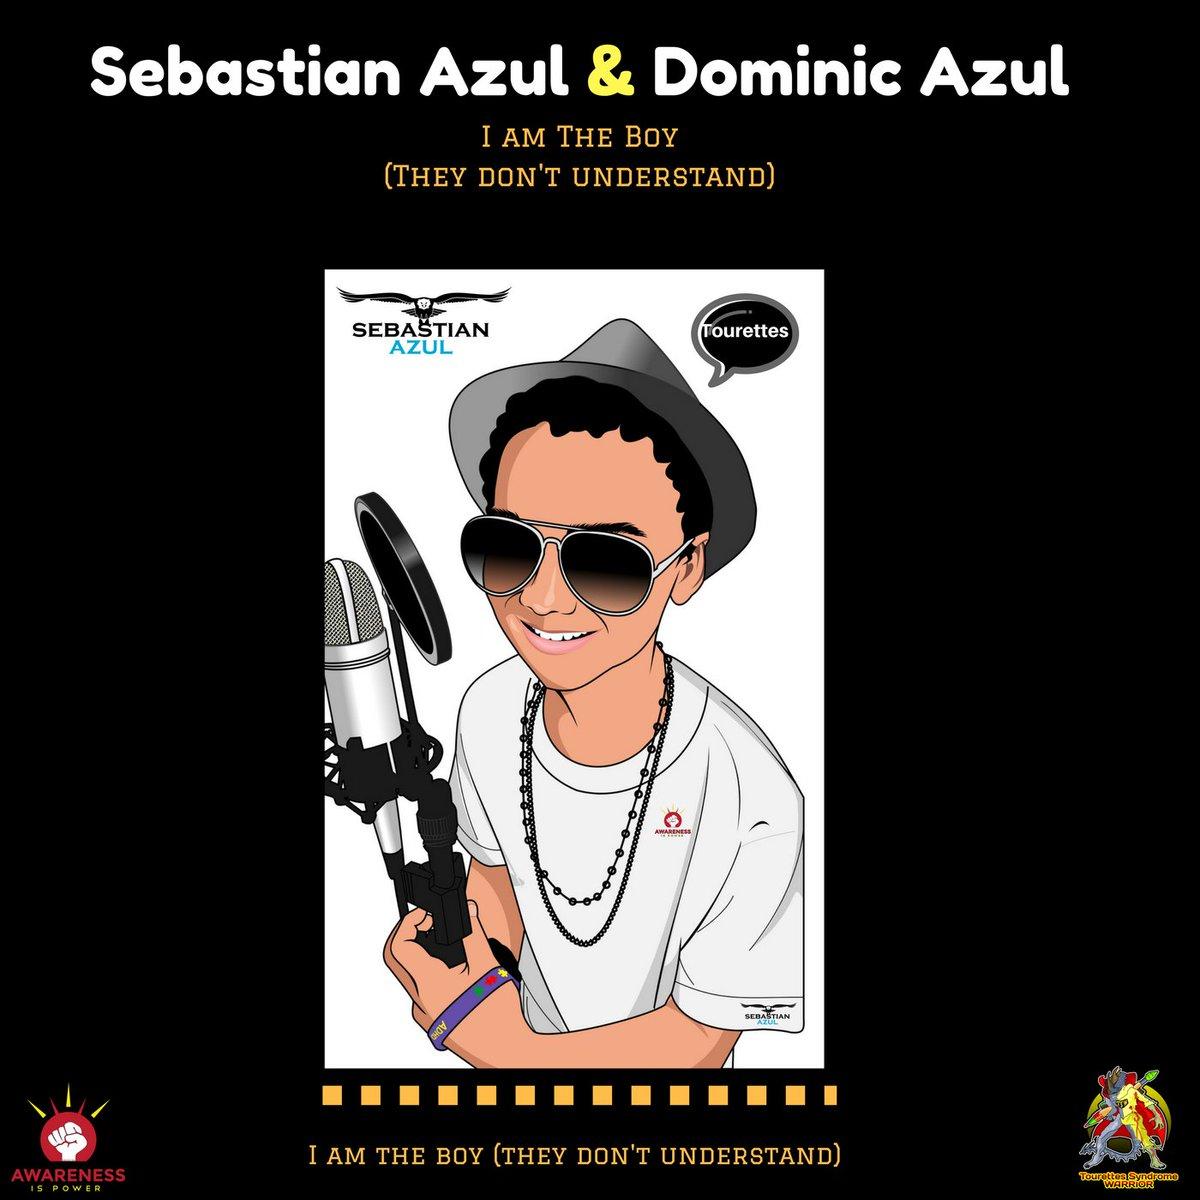 #OnLive  @SebastianAzul07 - I am the boy (they don&amp;amp;#039;t understand) #hits <br>http://pic.twitter.com/fZDAGrmFH6    http:// player.genzel.ca/allhits.html  &nbsp;